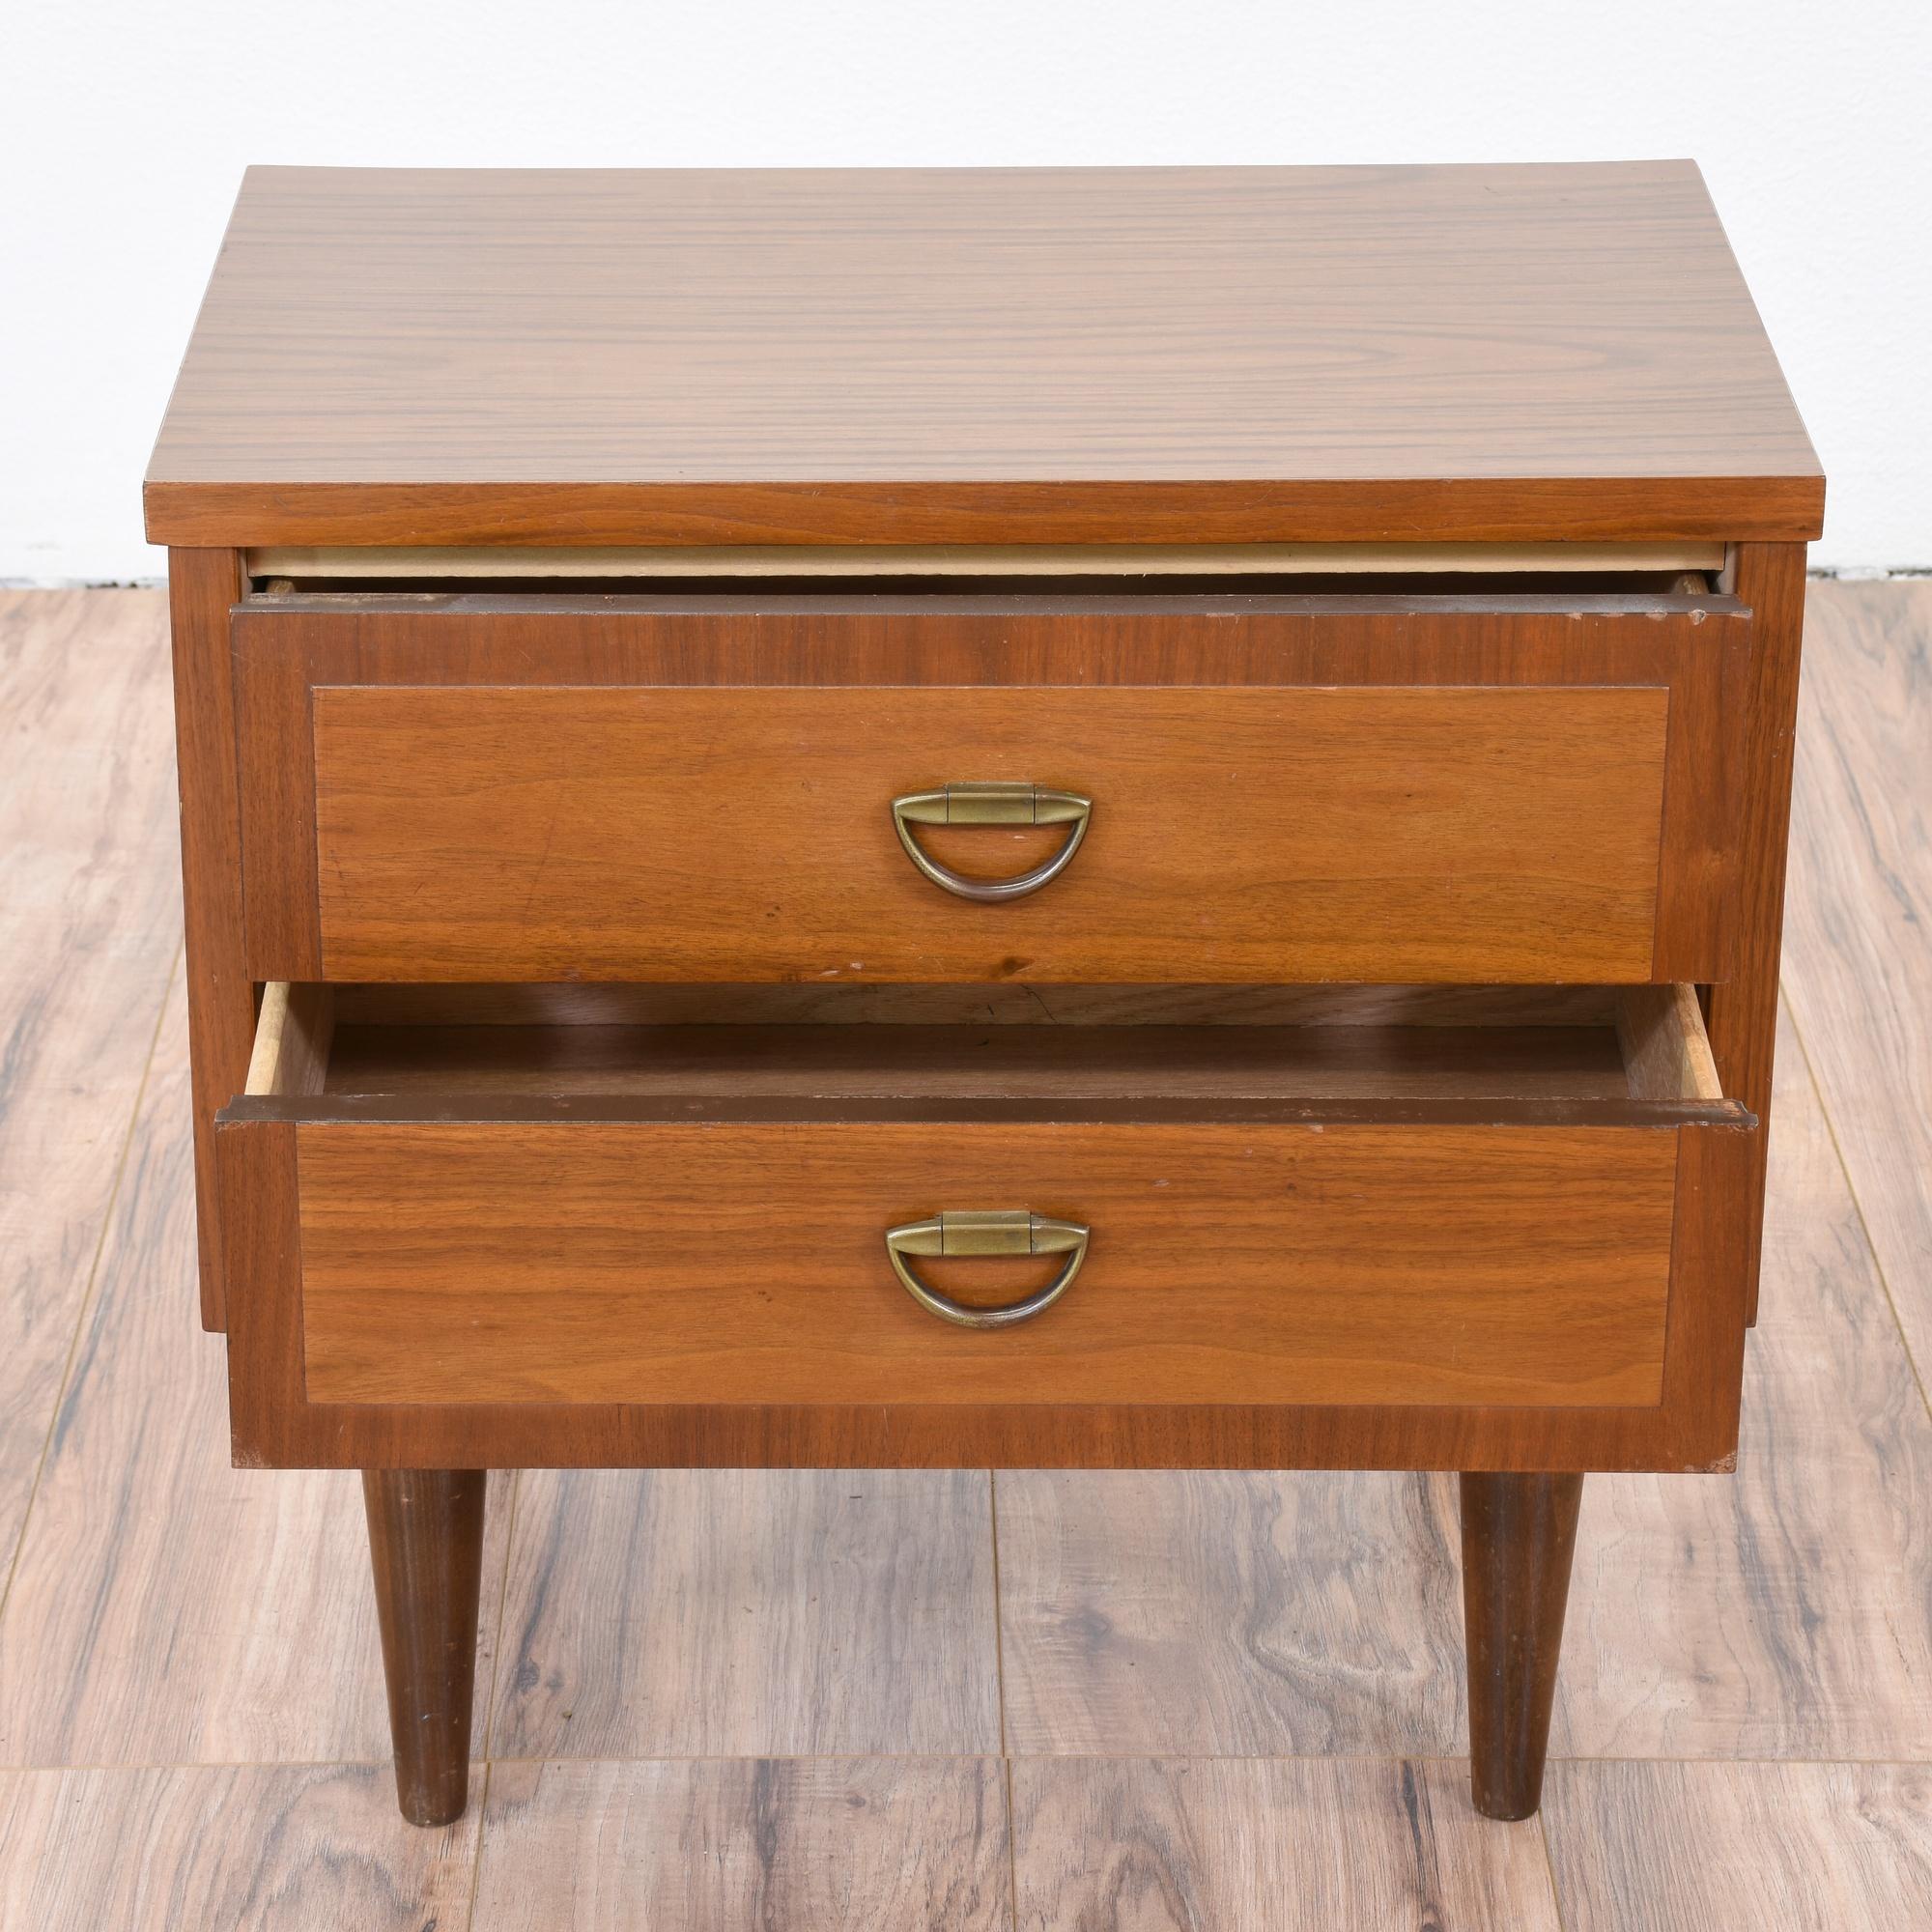 2 Drawer Mid Century Modern Nightstand | Loveseat Vintage ...